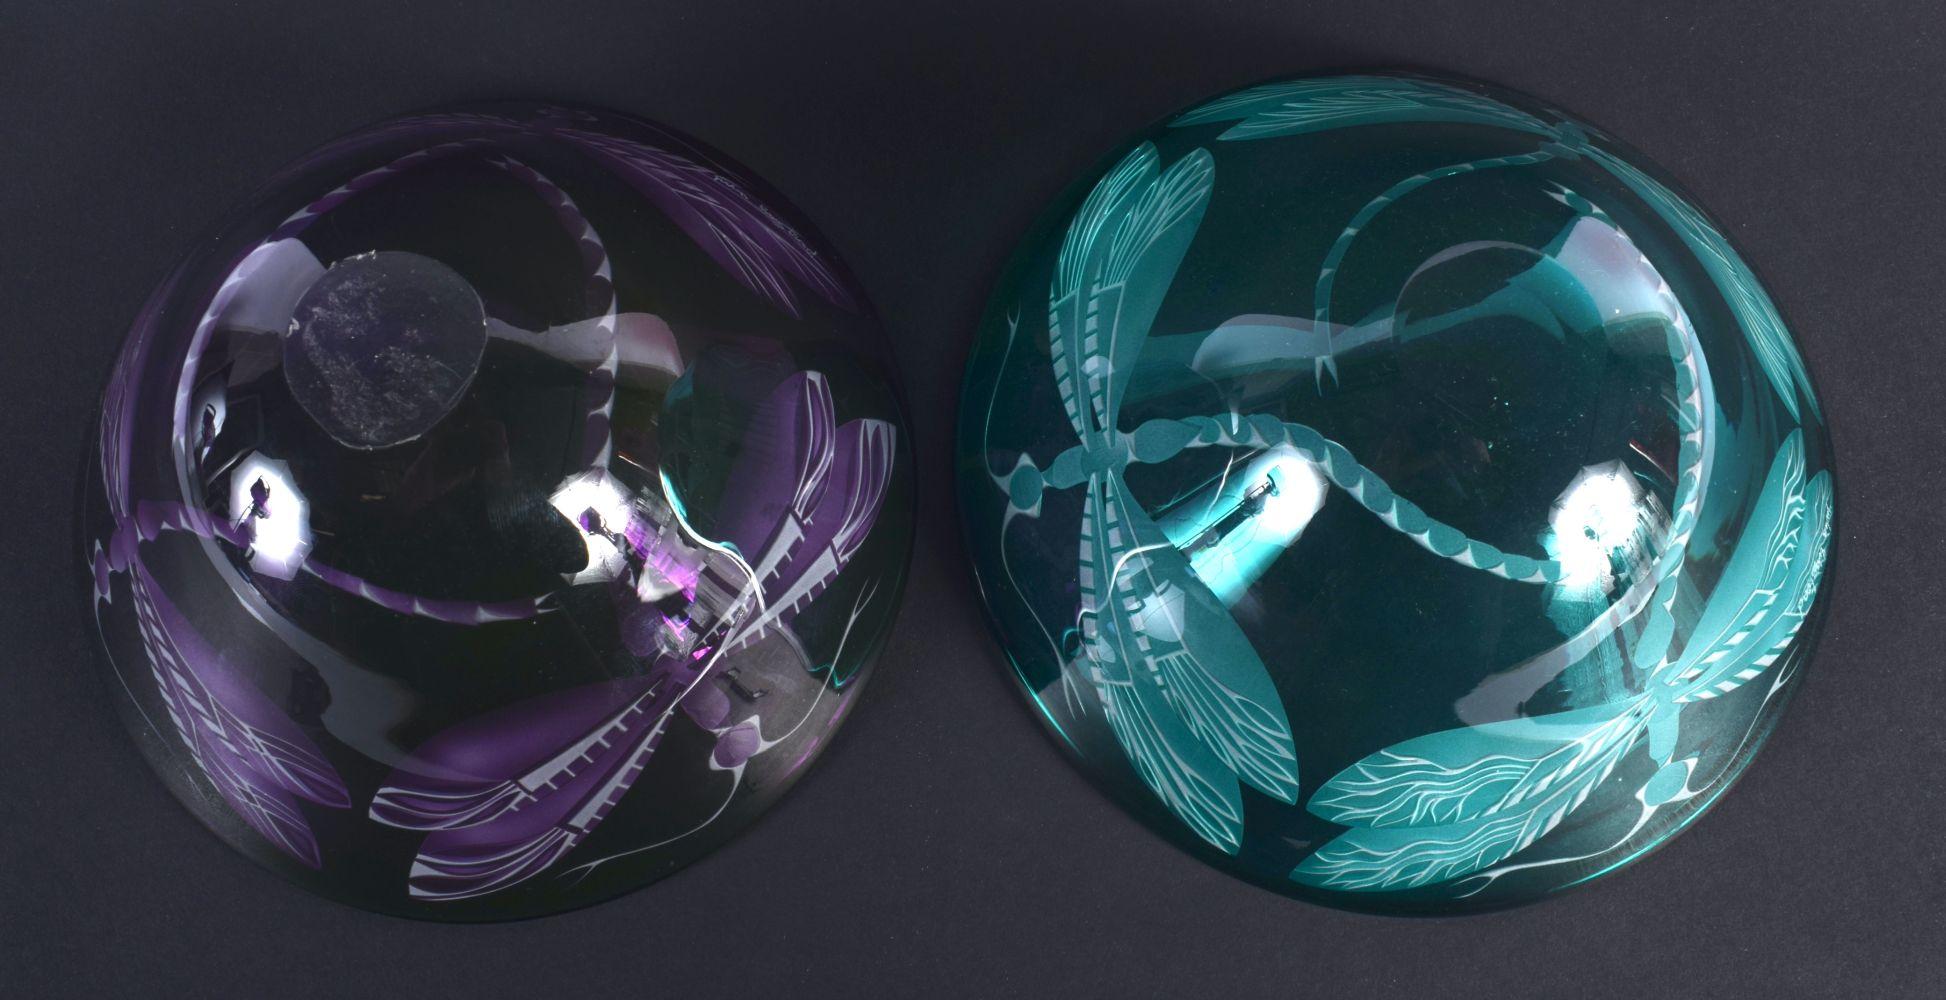 A PAIR OF CONTEMPORARY ART GLASS DRAGONFLY BOWLS. 13 cm diameter. - Image 3 of 3